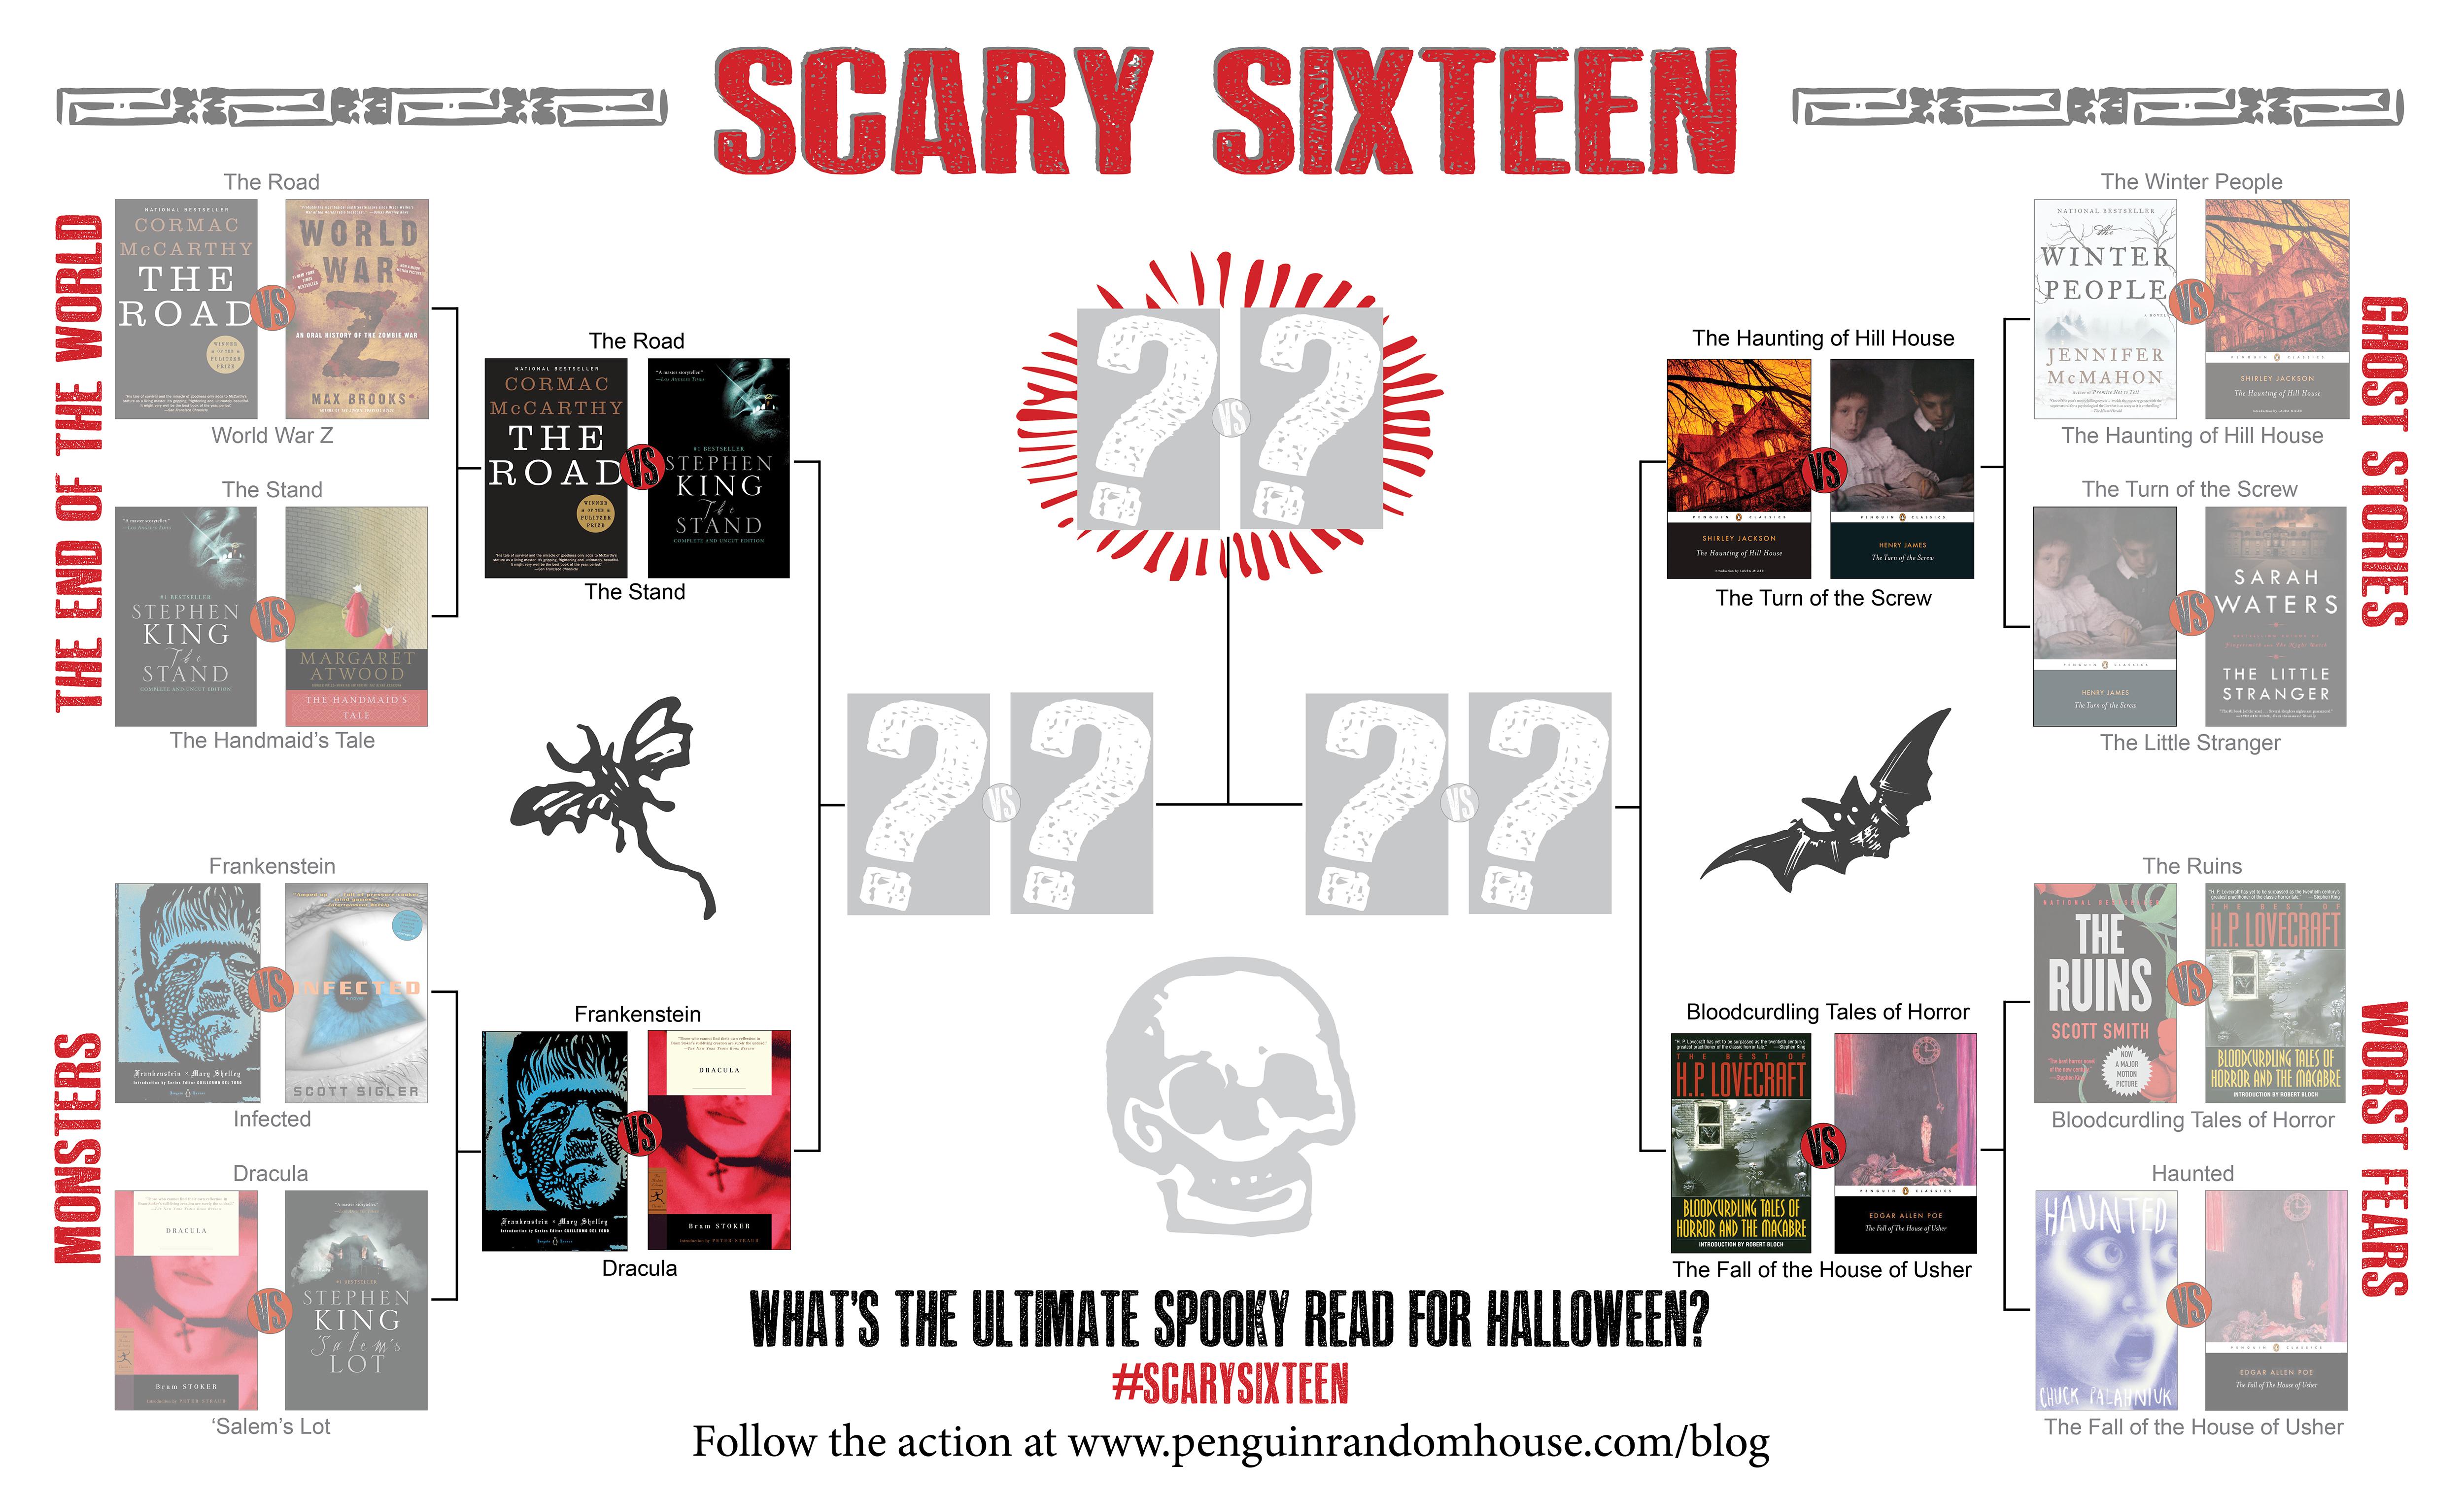 Scary Sixteen